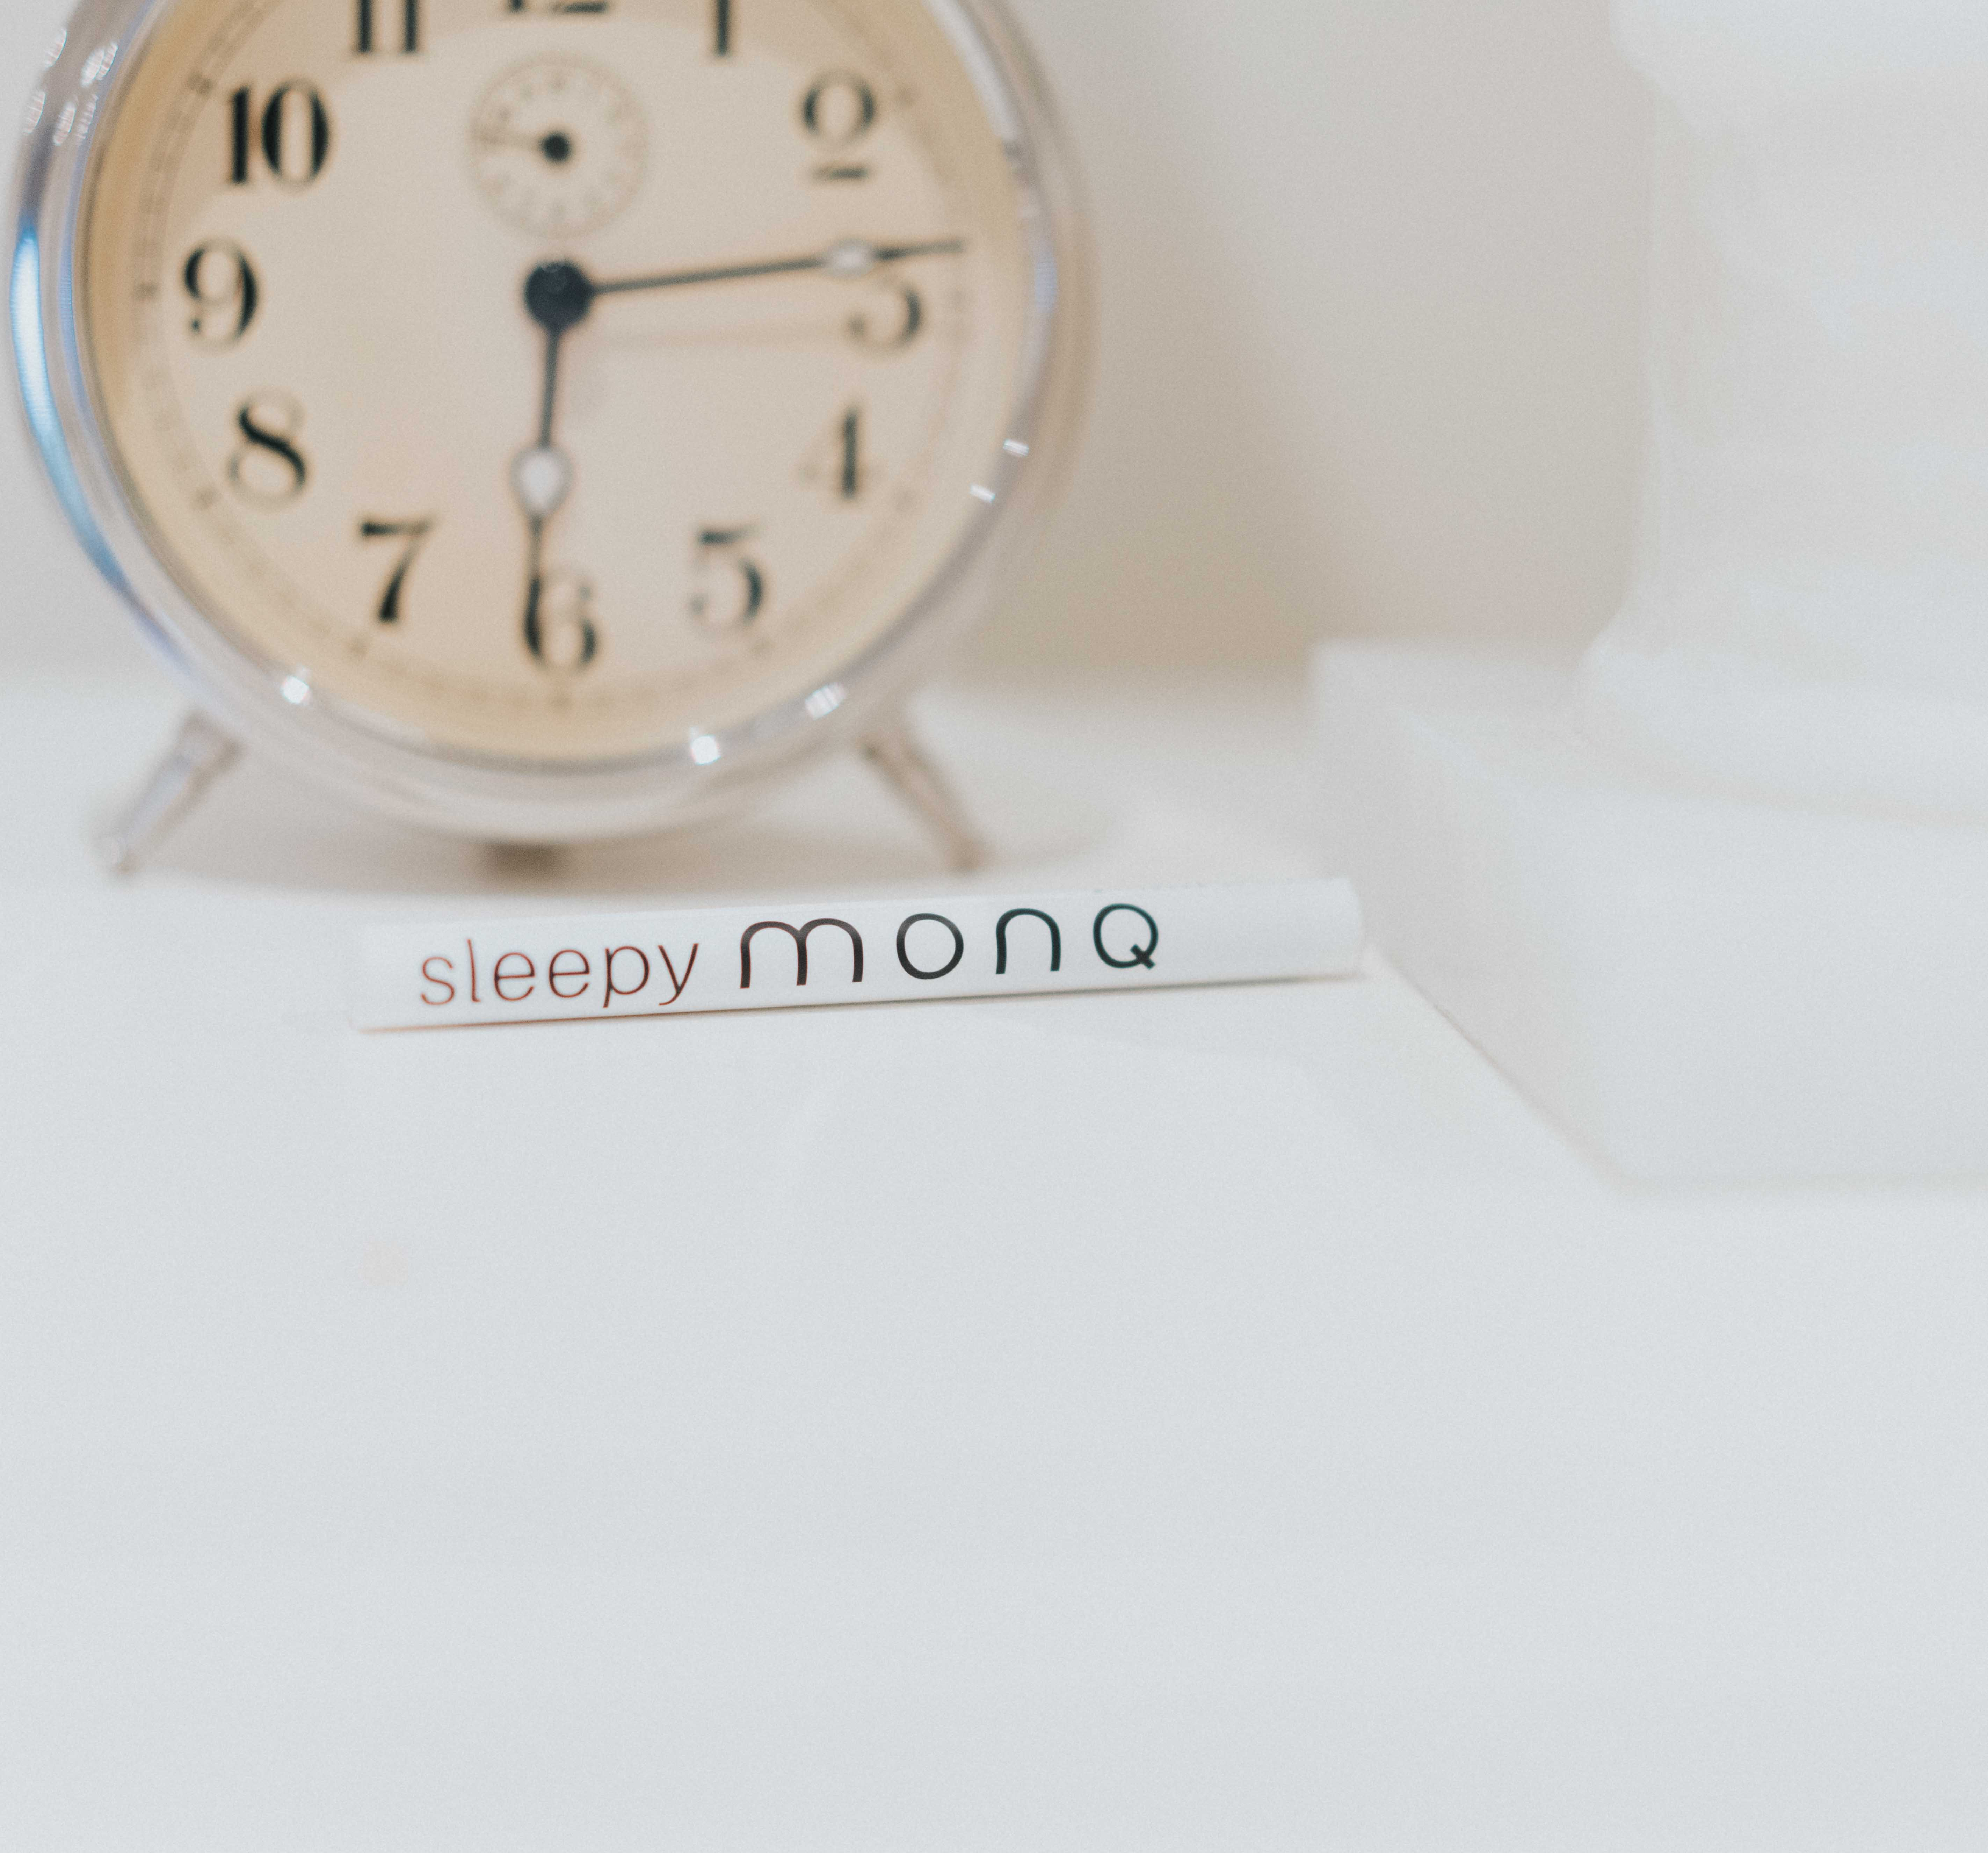 MONQ, LLC